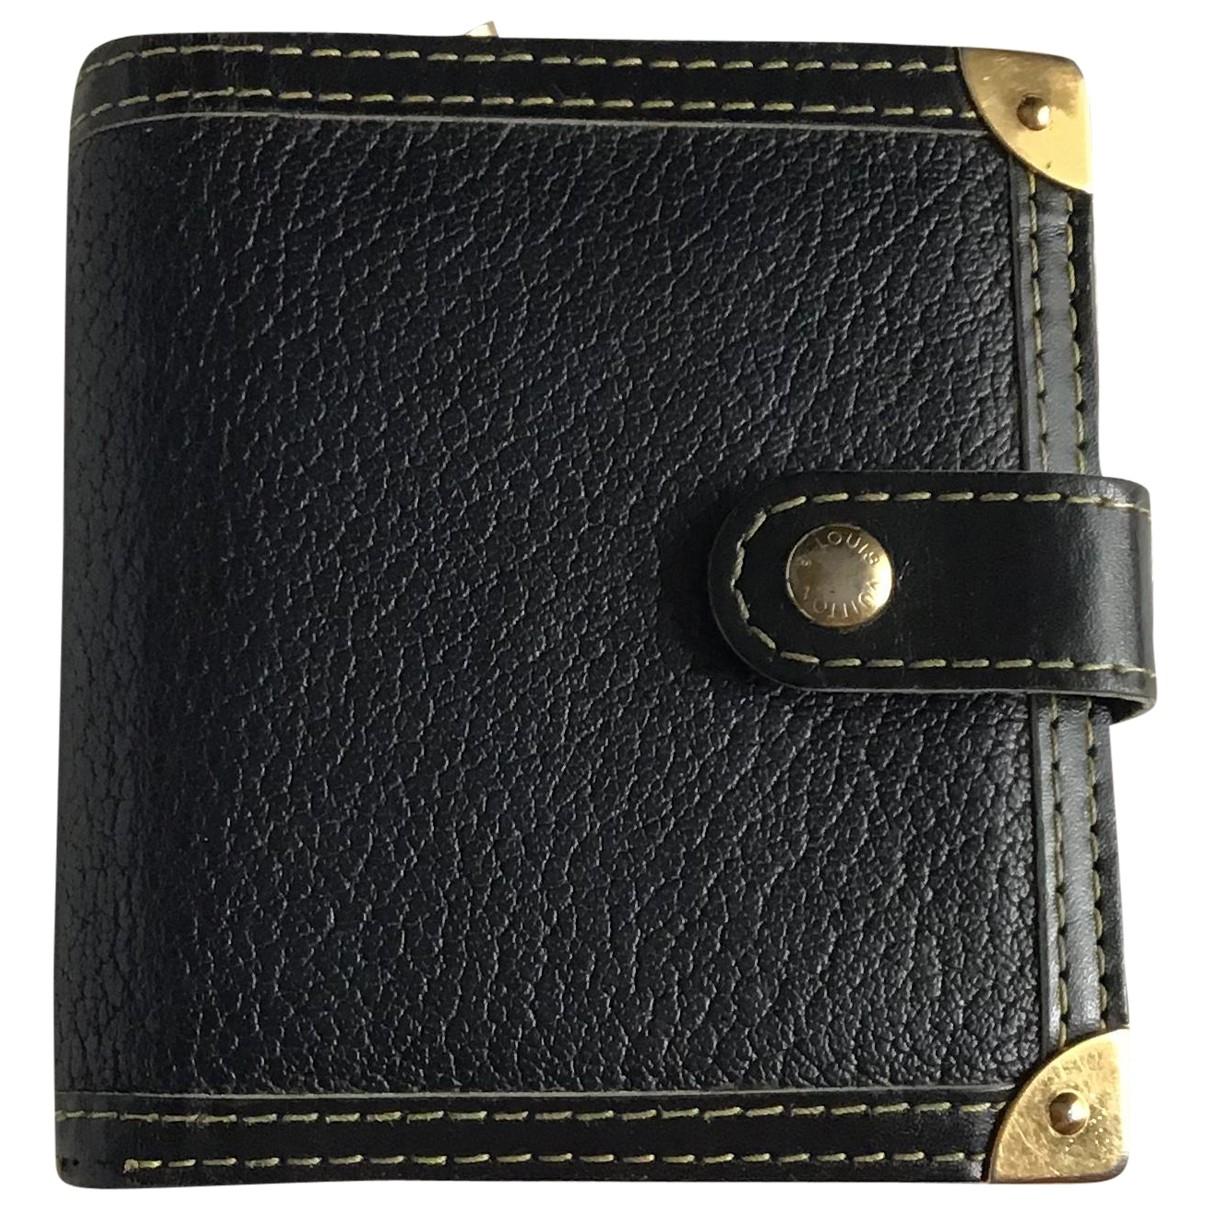 Louis Vuitton \N Black Leather wallet for Women \N